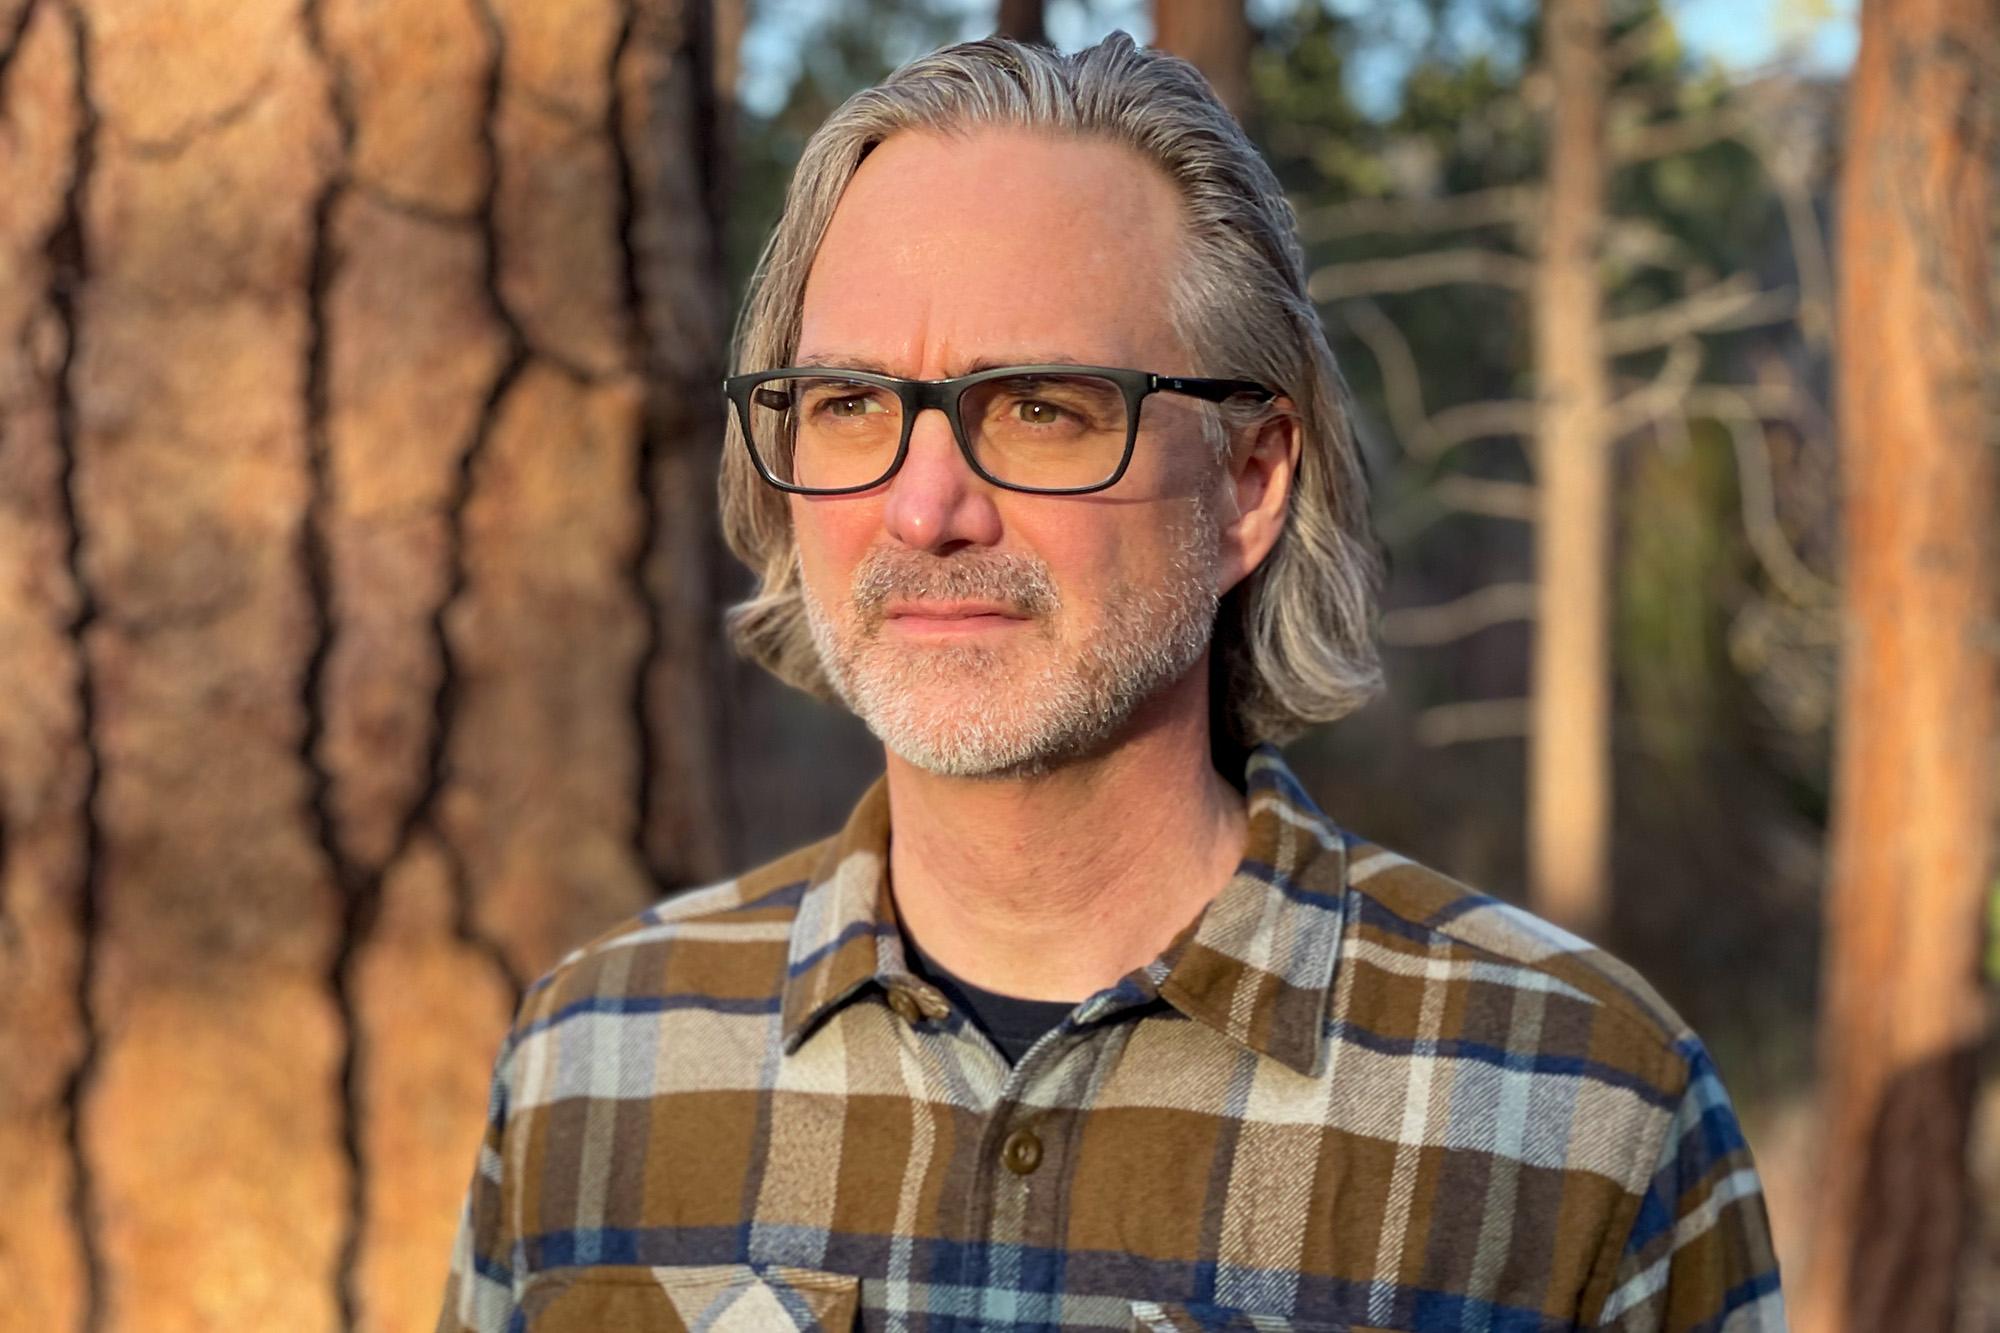 University of Iowa alumnus and film producer Michael Scheuerman outdoors in Oregon